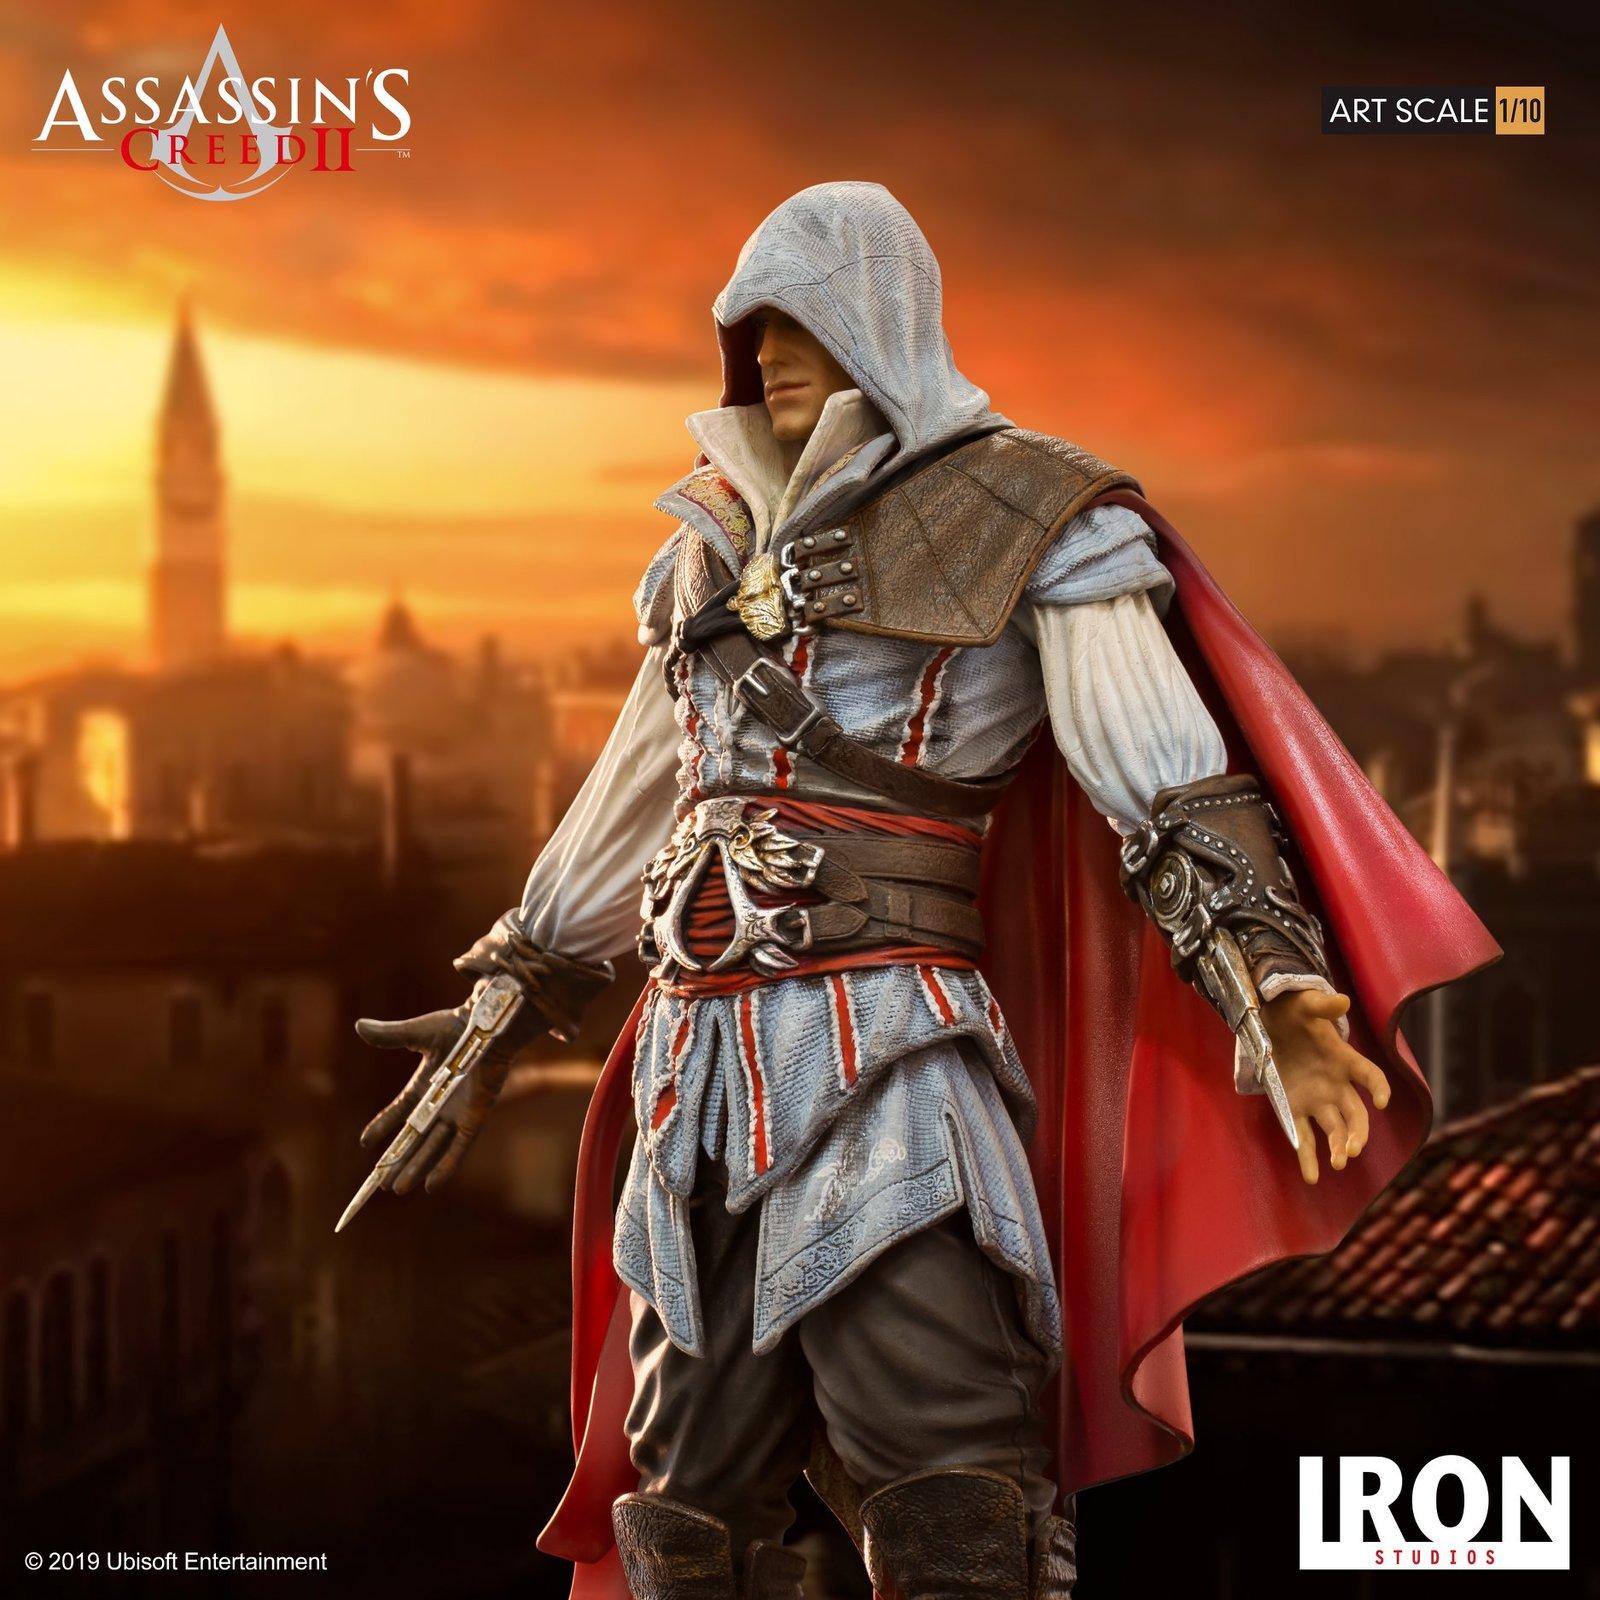 Assassin's Creed 2 - Ezio Auditore (Deluxe) 1:10 Scale Statue image